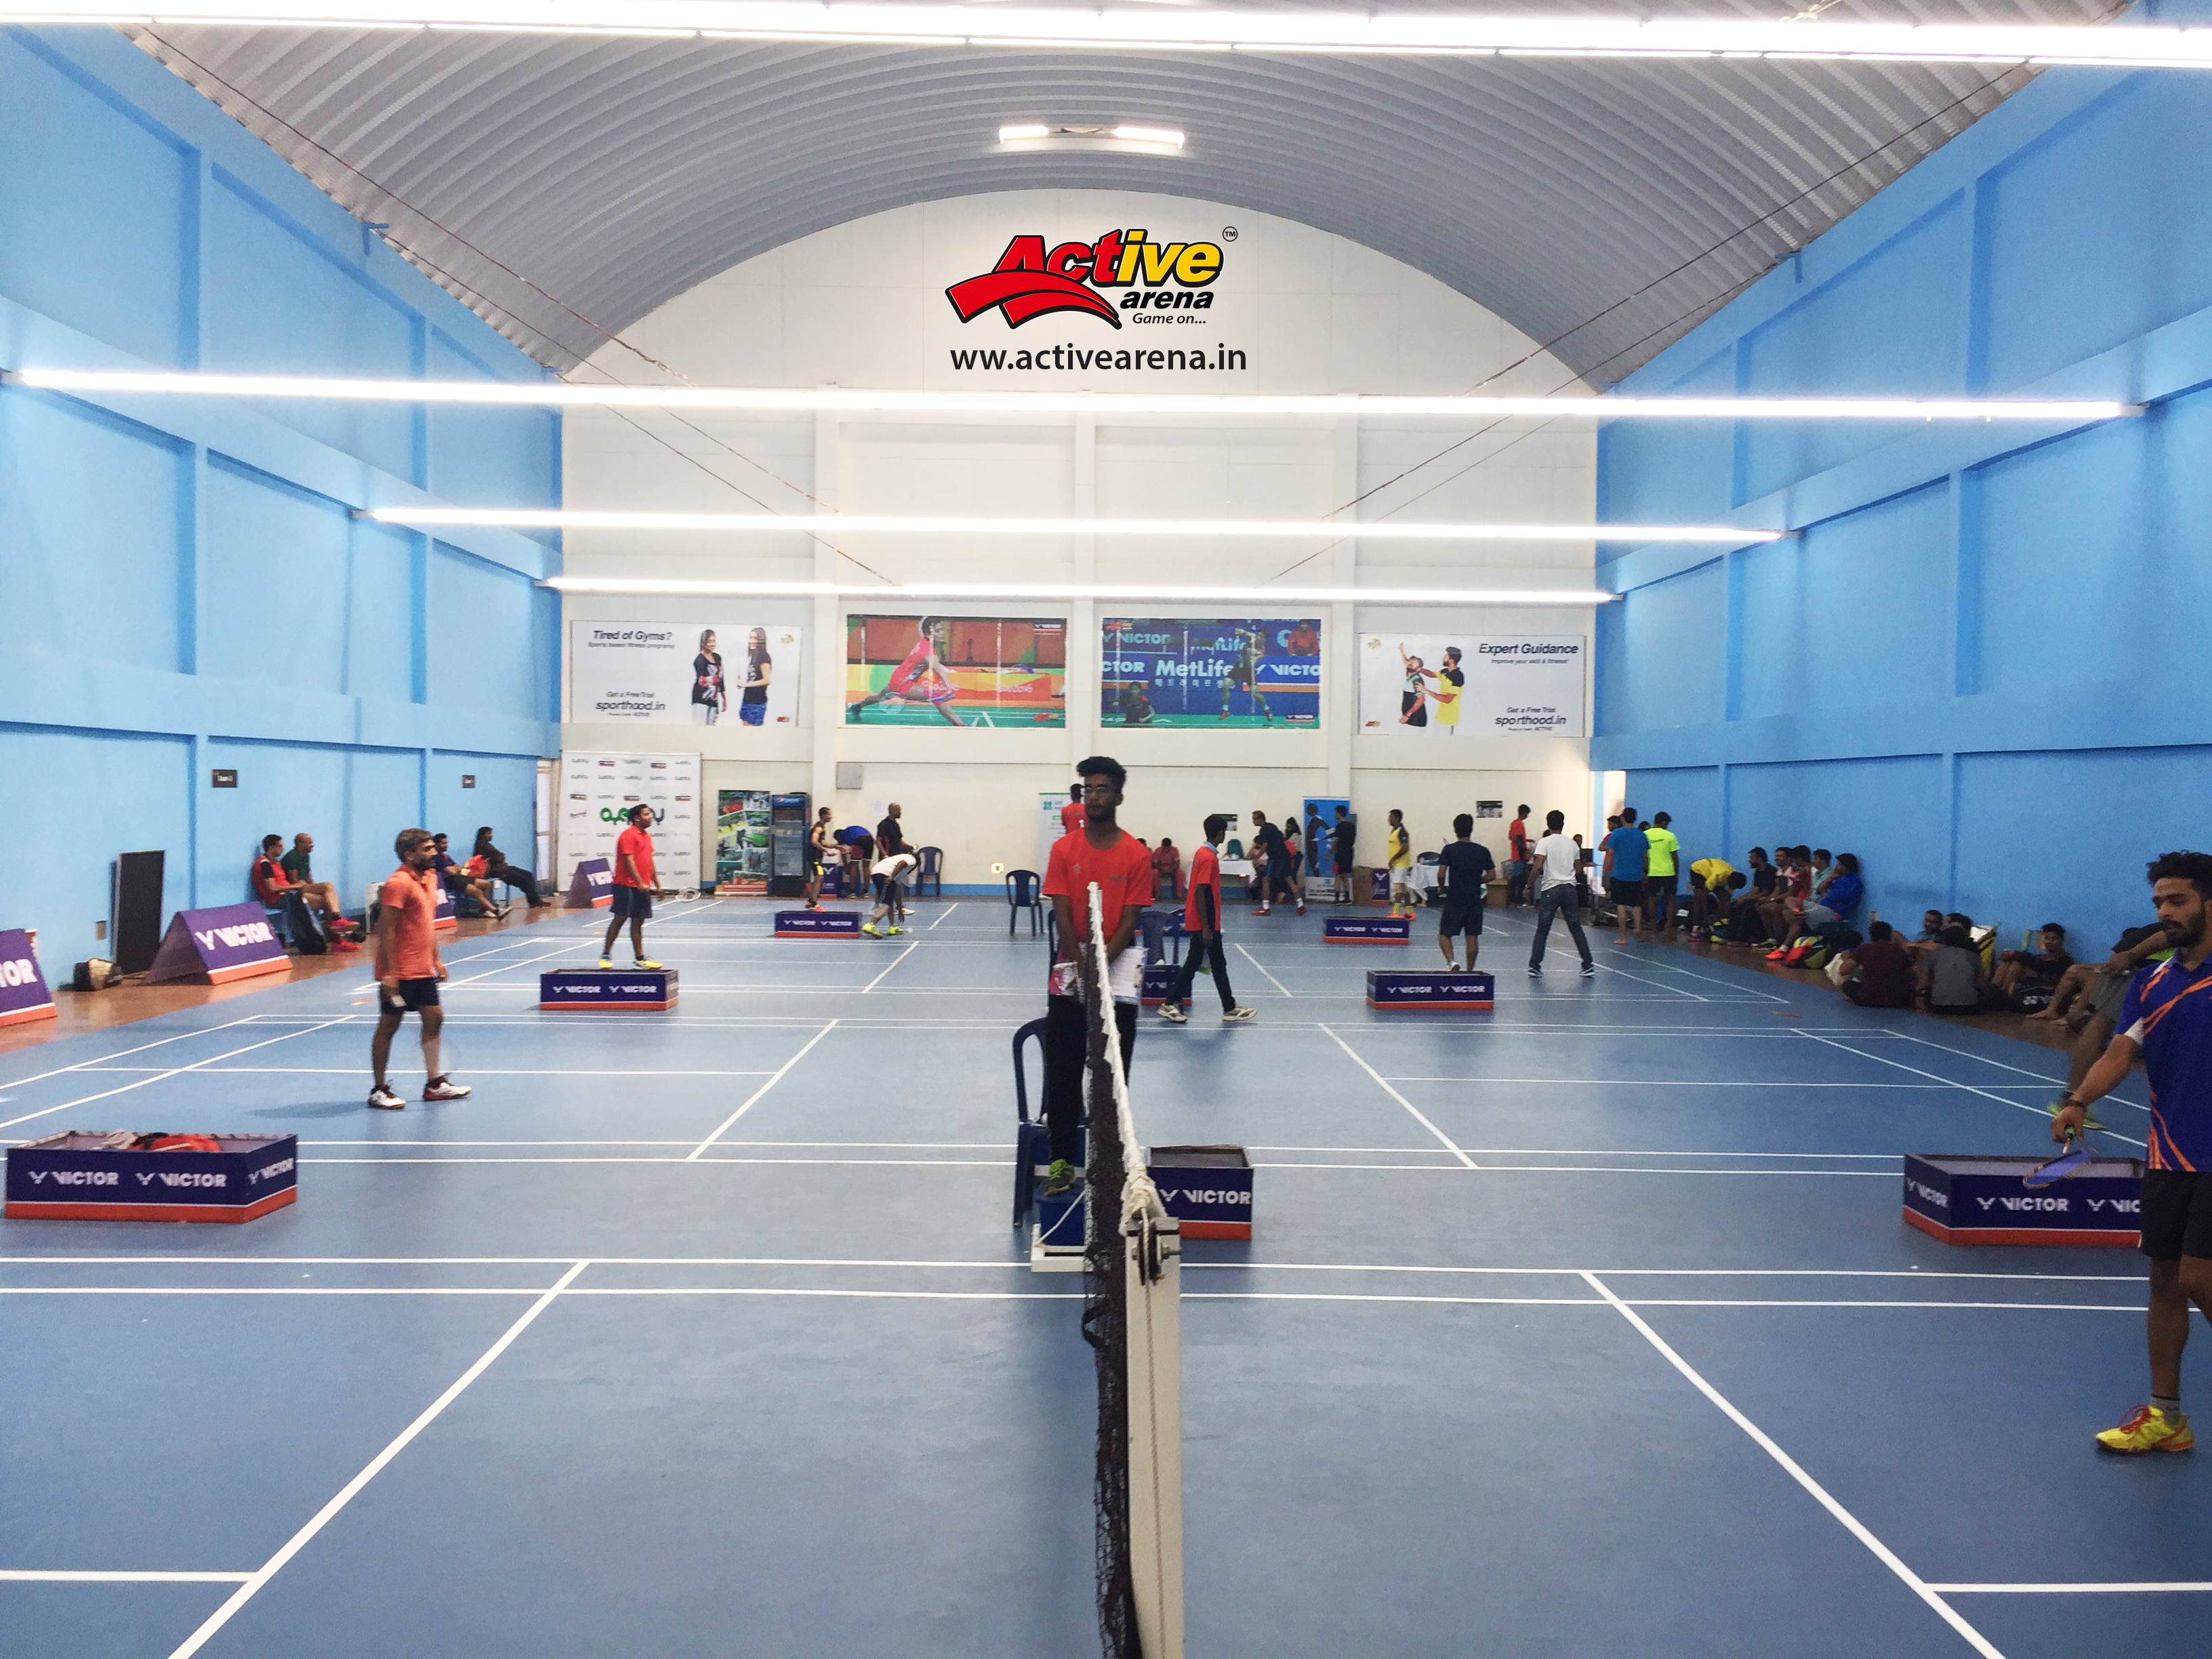 Active Arena Home Page Badminton Tournament Corporate Events Event Venues